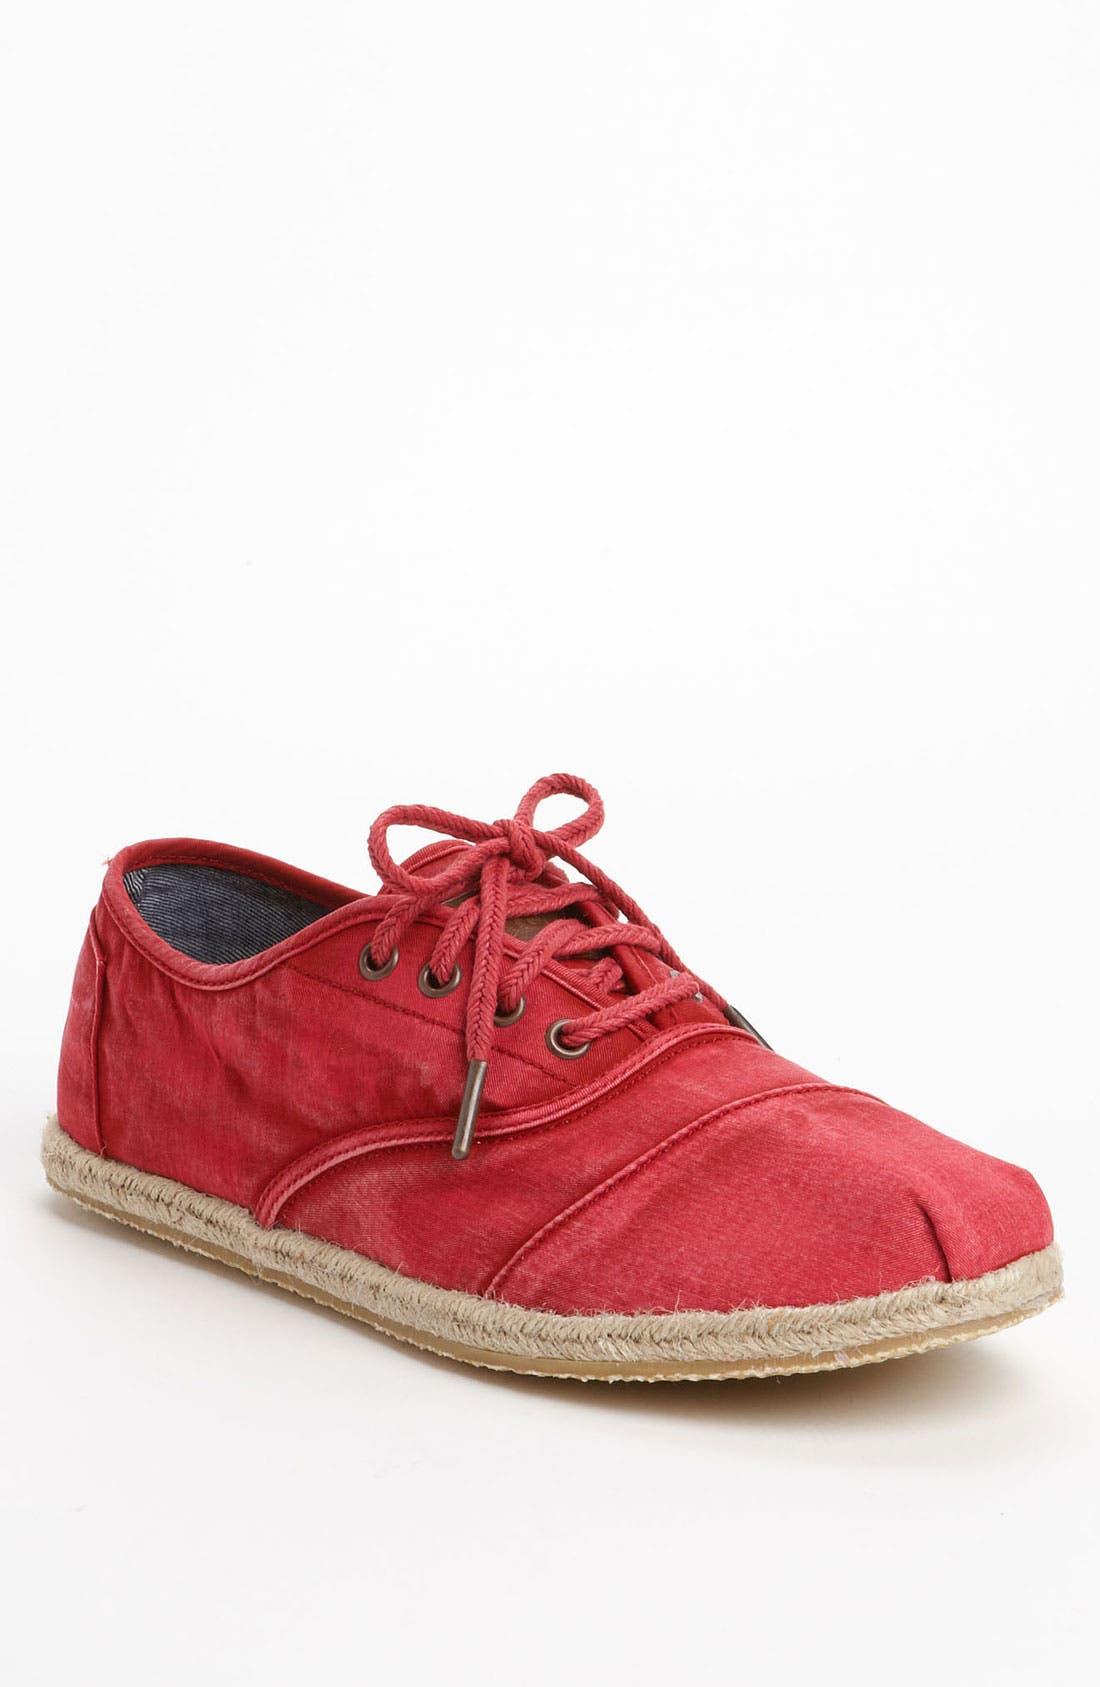 Main Image - TOMS 'Cordones' Sneaker (Men)